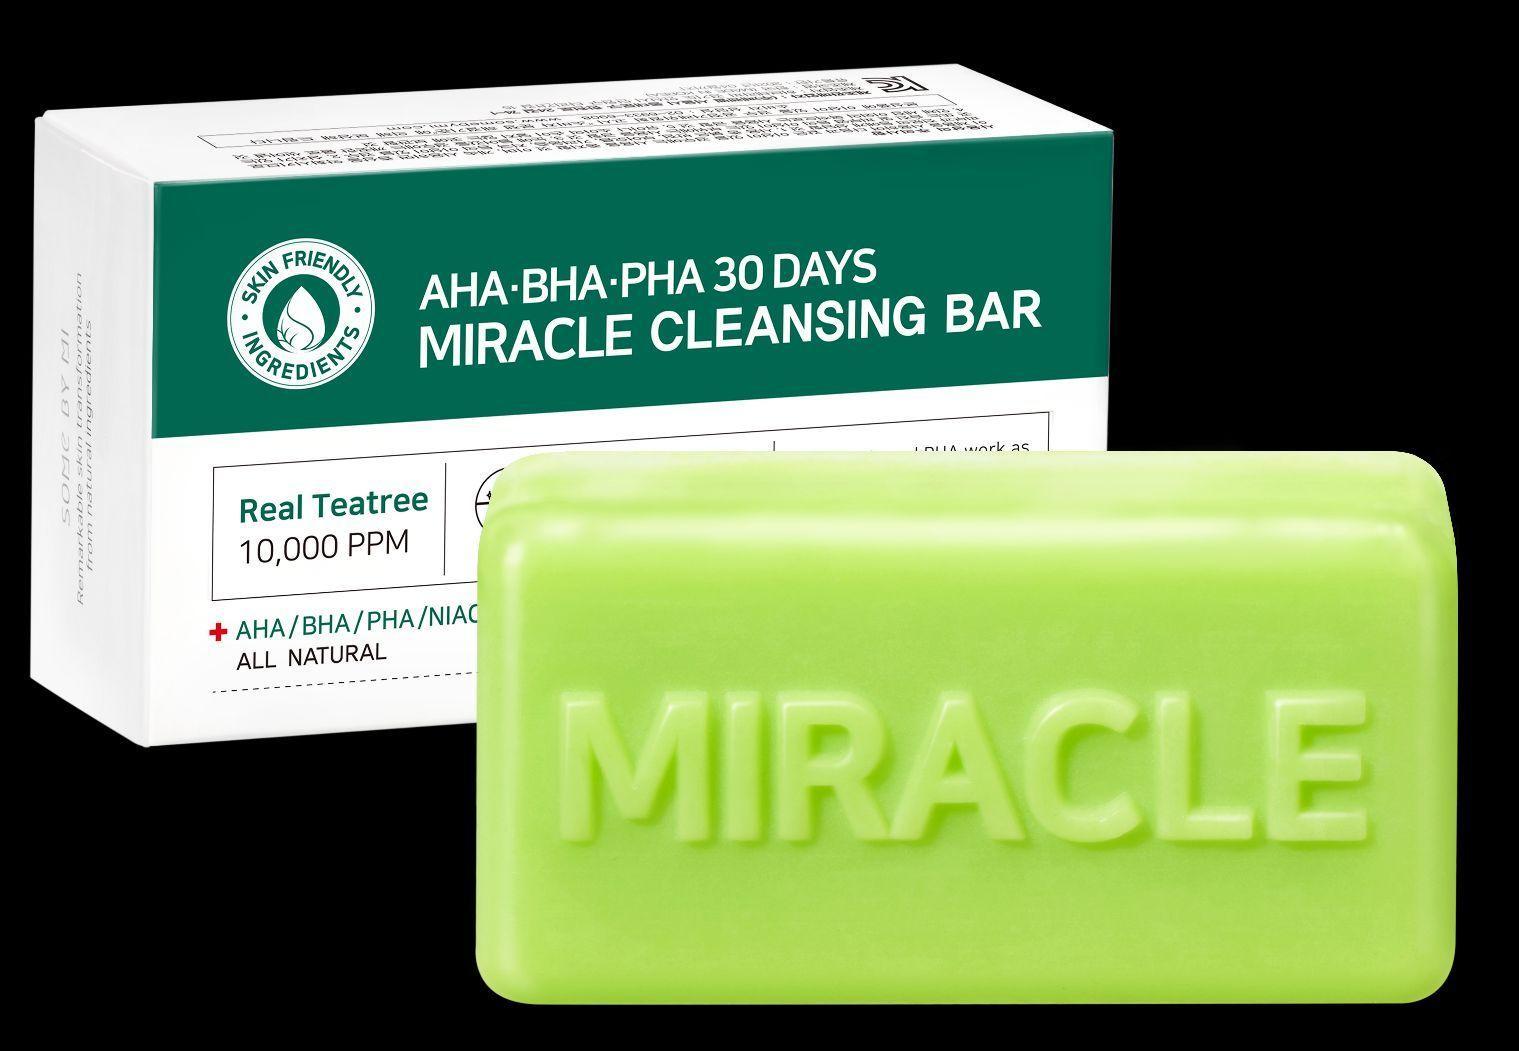 ... Somebymi AHA BHA PHA 30 Days Miracle Cleansing Bar - 3